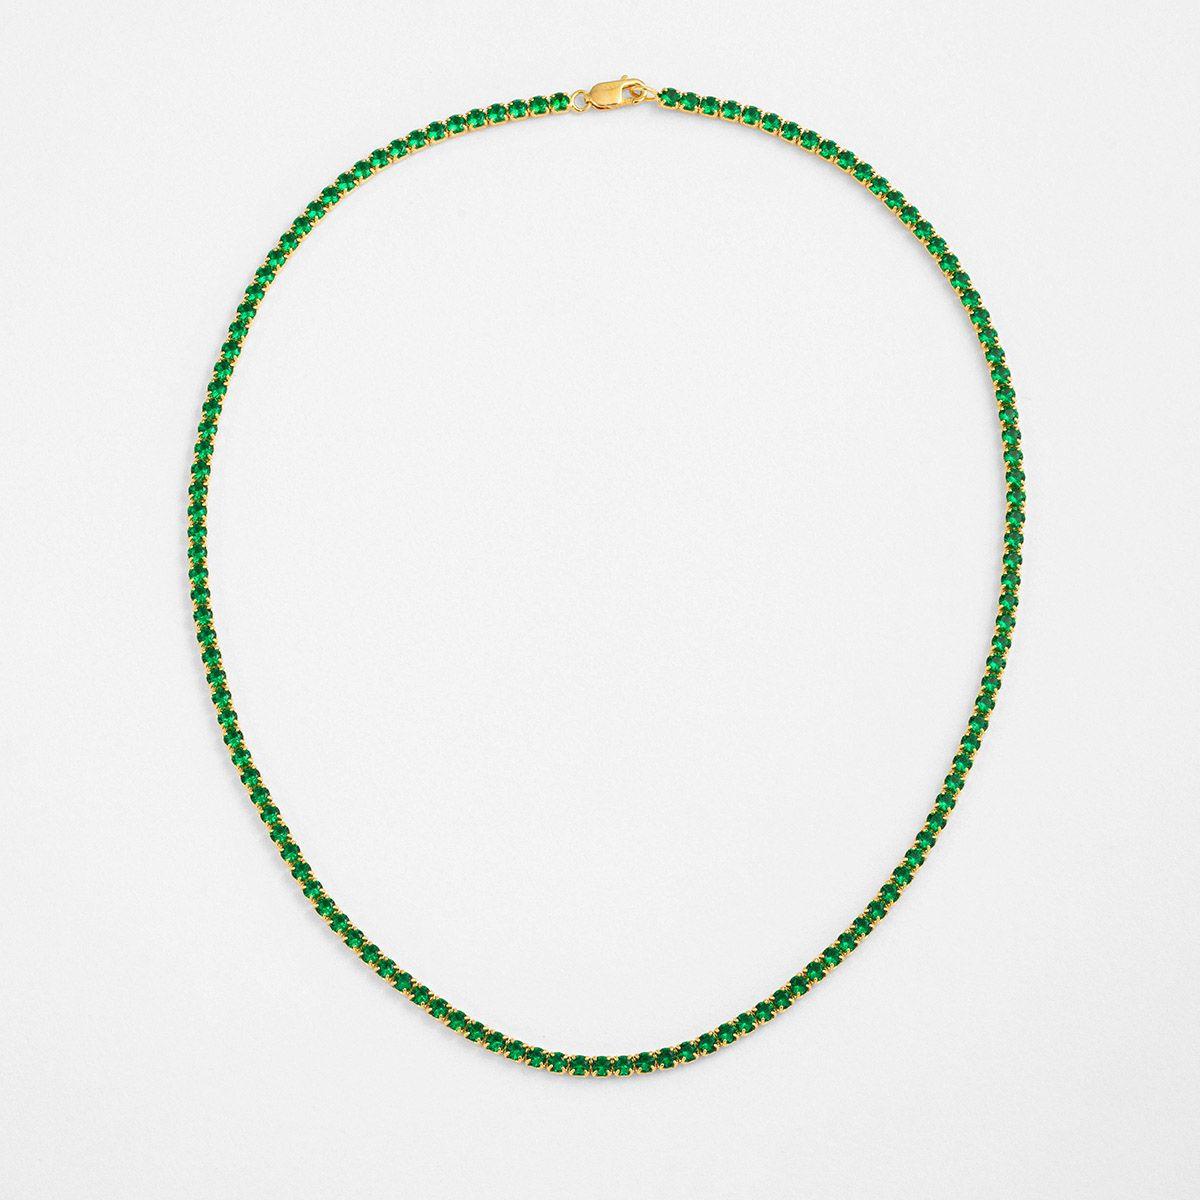 Tennis Green - Choker - 18k vergoldet